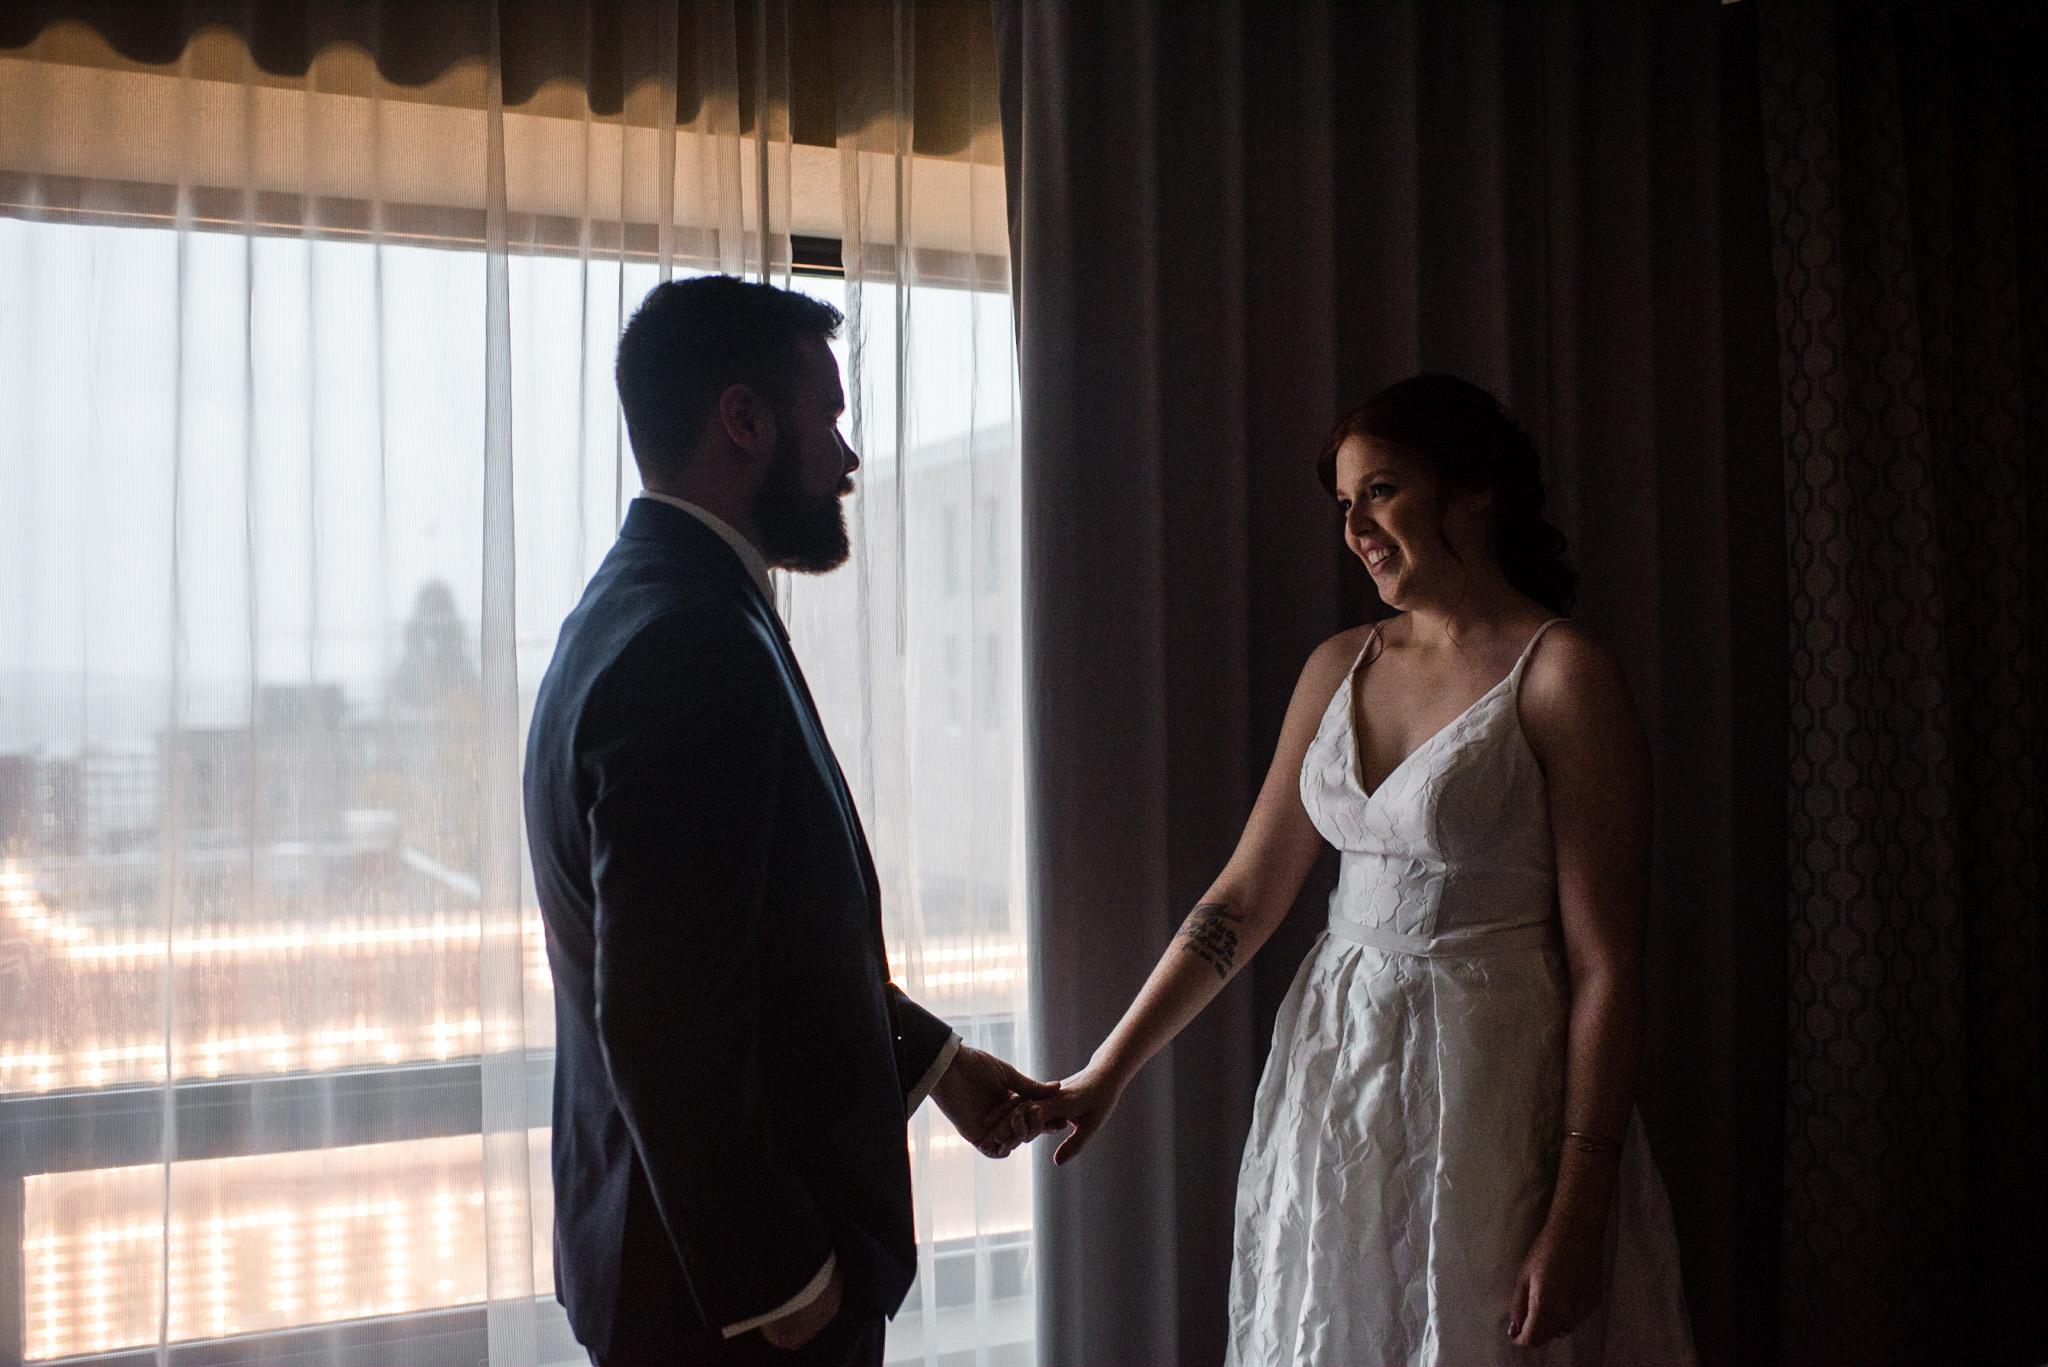 130-wedding-couple-getting-ready-toronto-hotel-rainy-day-photographer.jpg